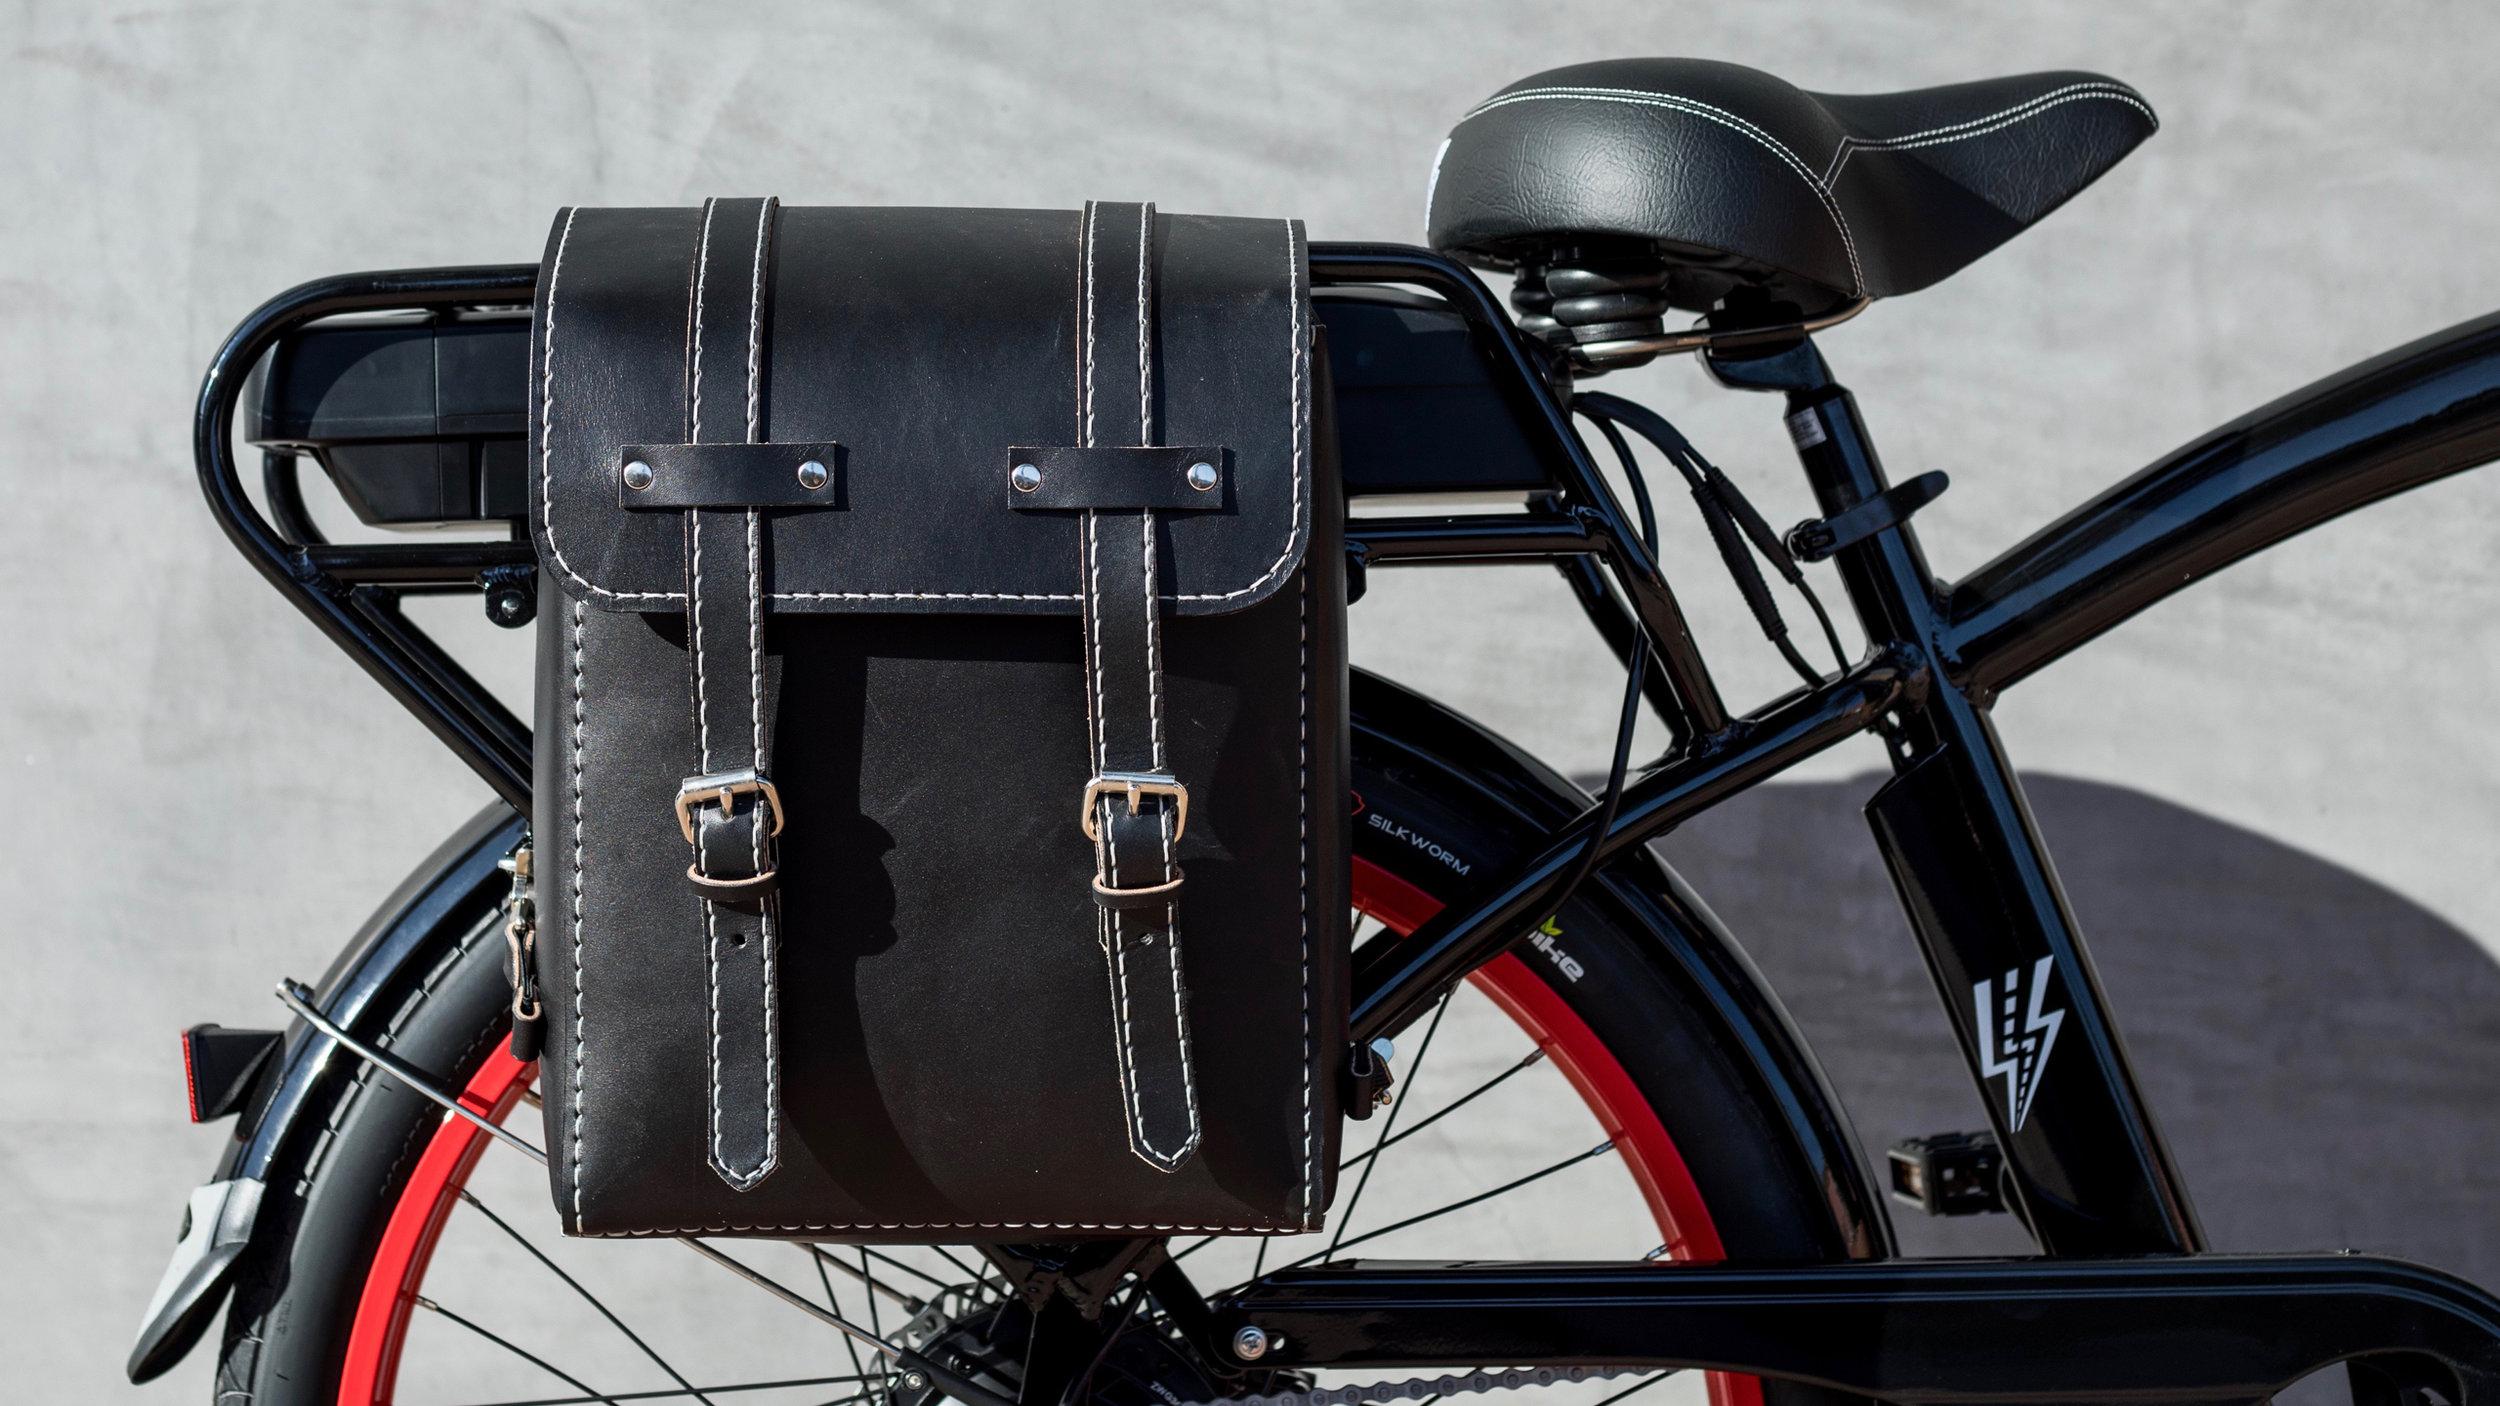 Electric Bike Company Model S electric bike review: Dreamy